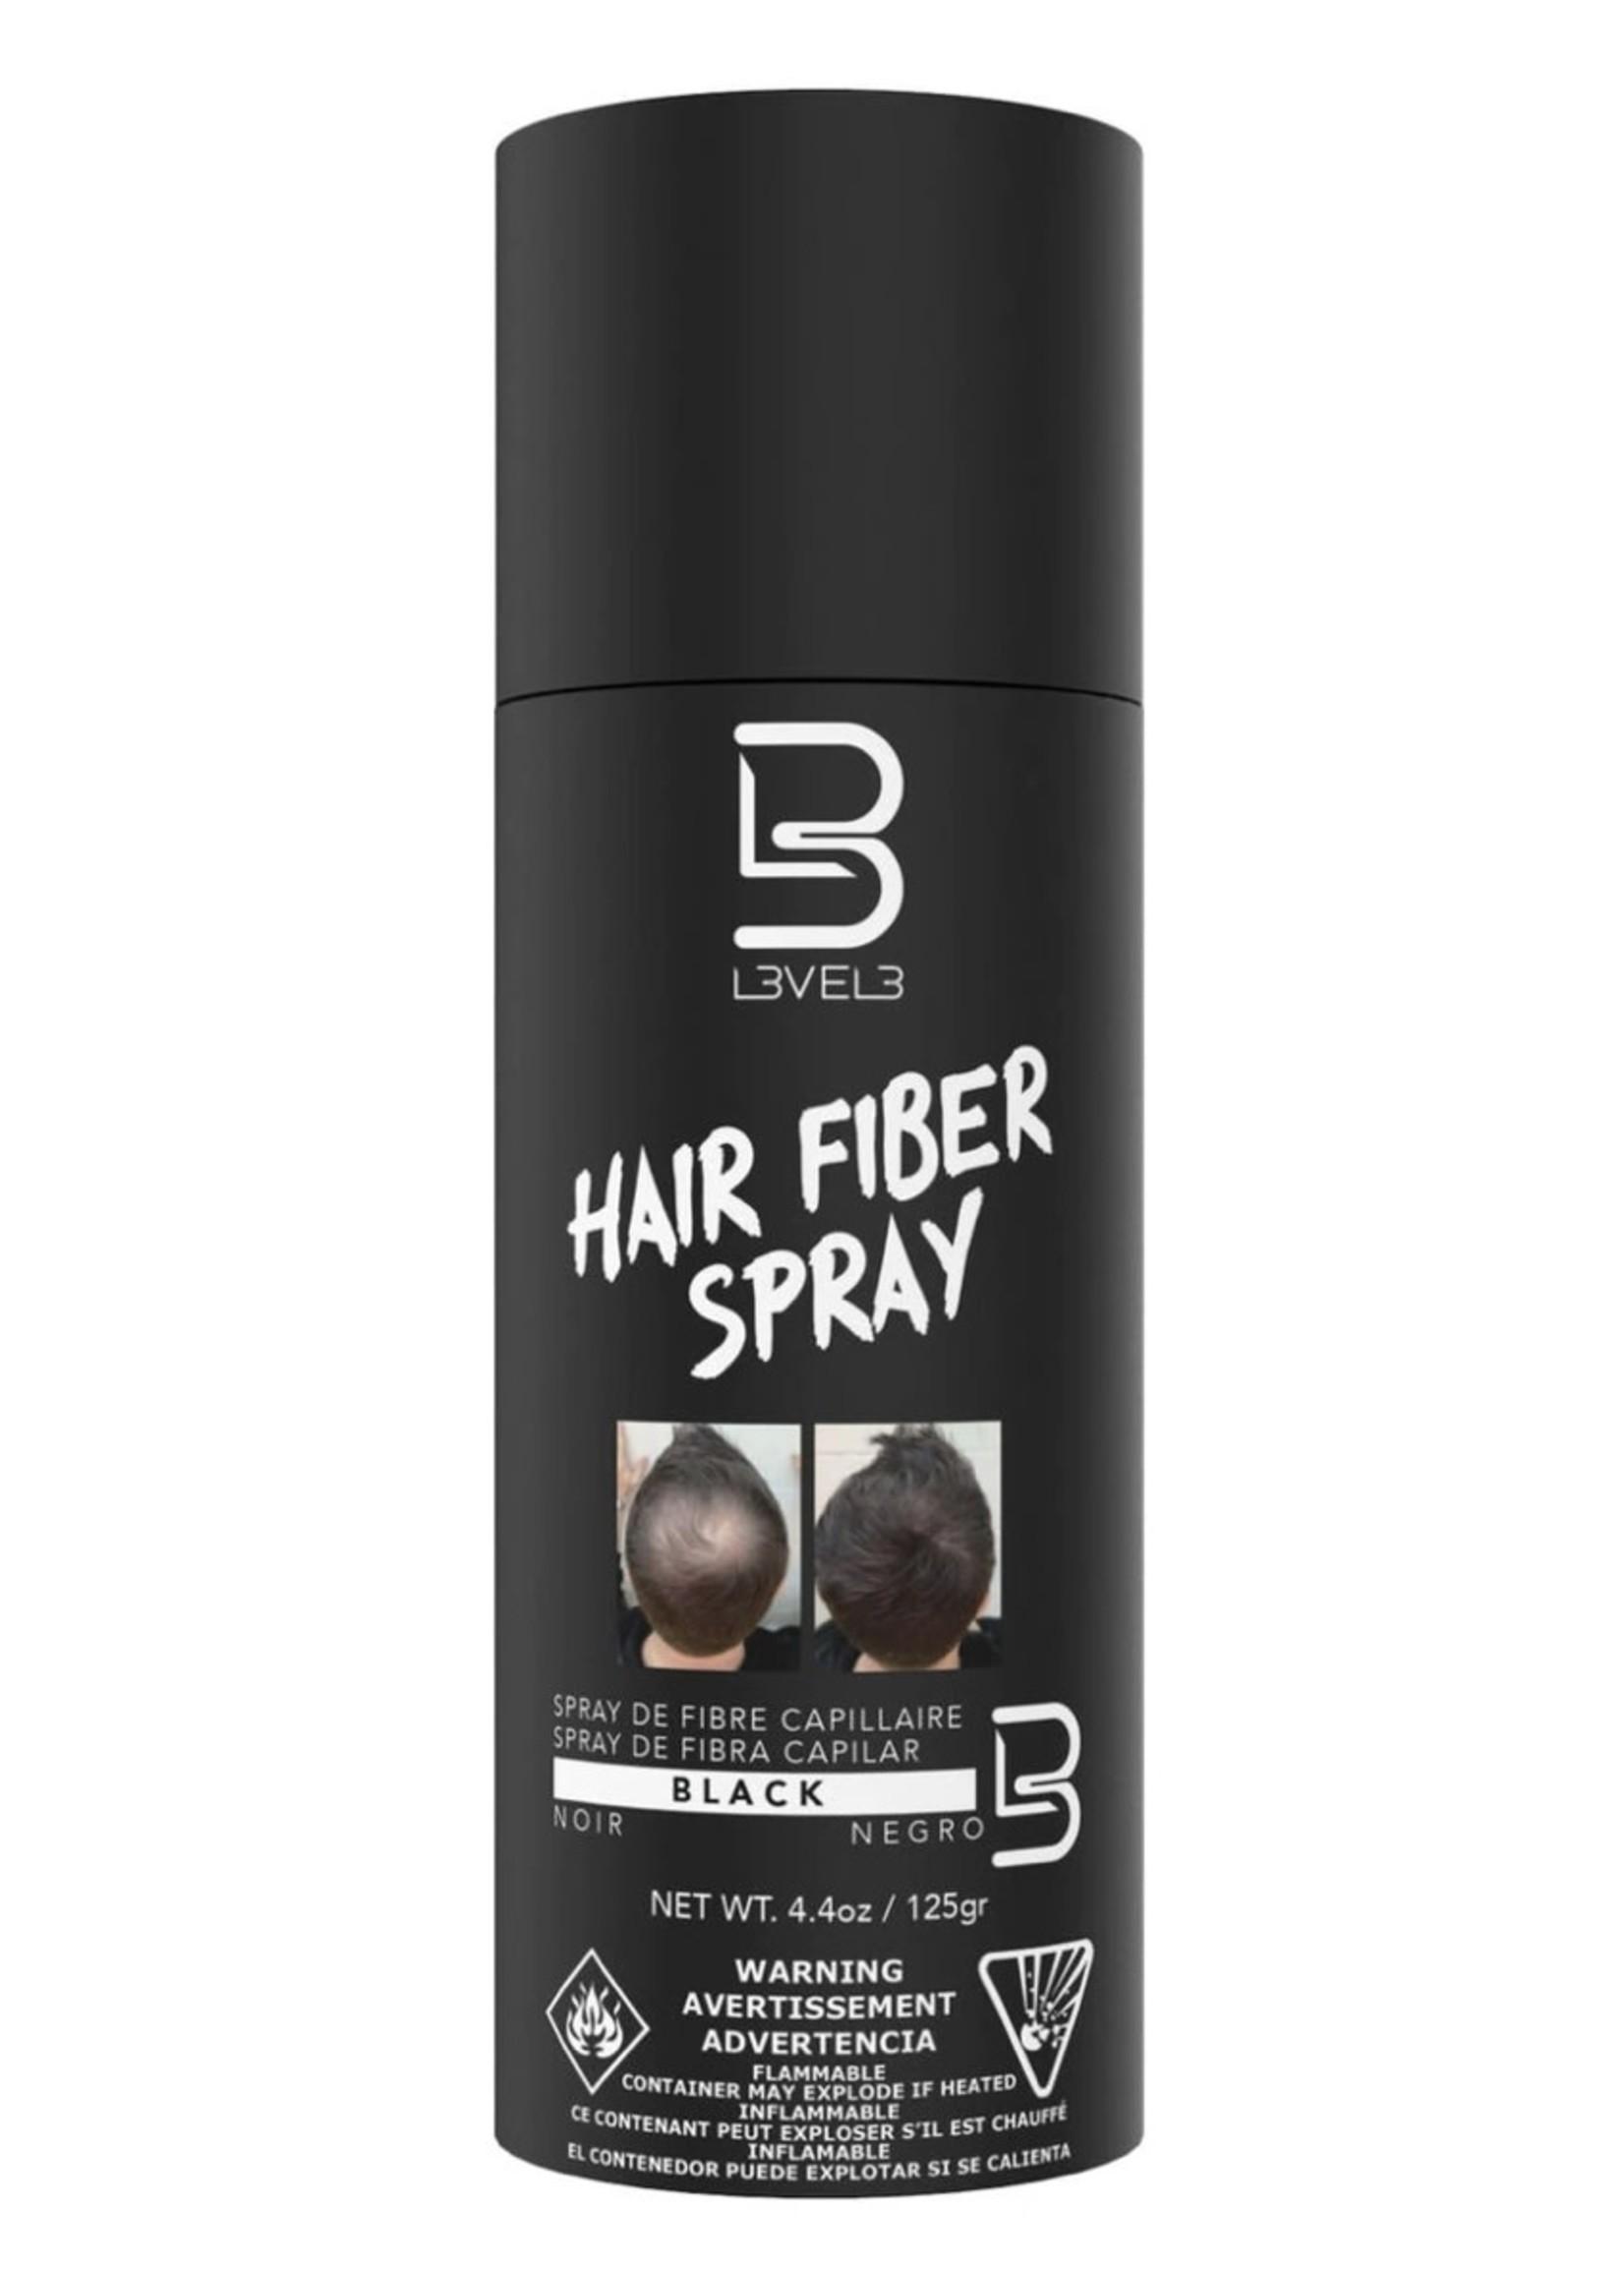 Level 3 L3 Black Hair Fiber Spray